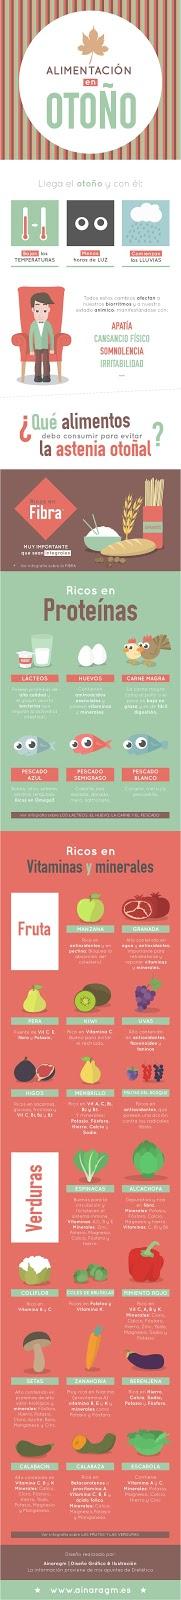 http://www.ainaragm.es/alimentacion-otono/#sthash.WVXusiiv.dpbs